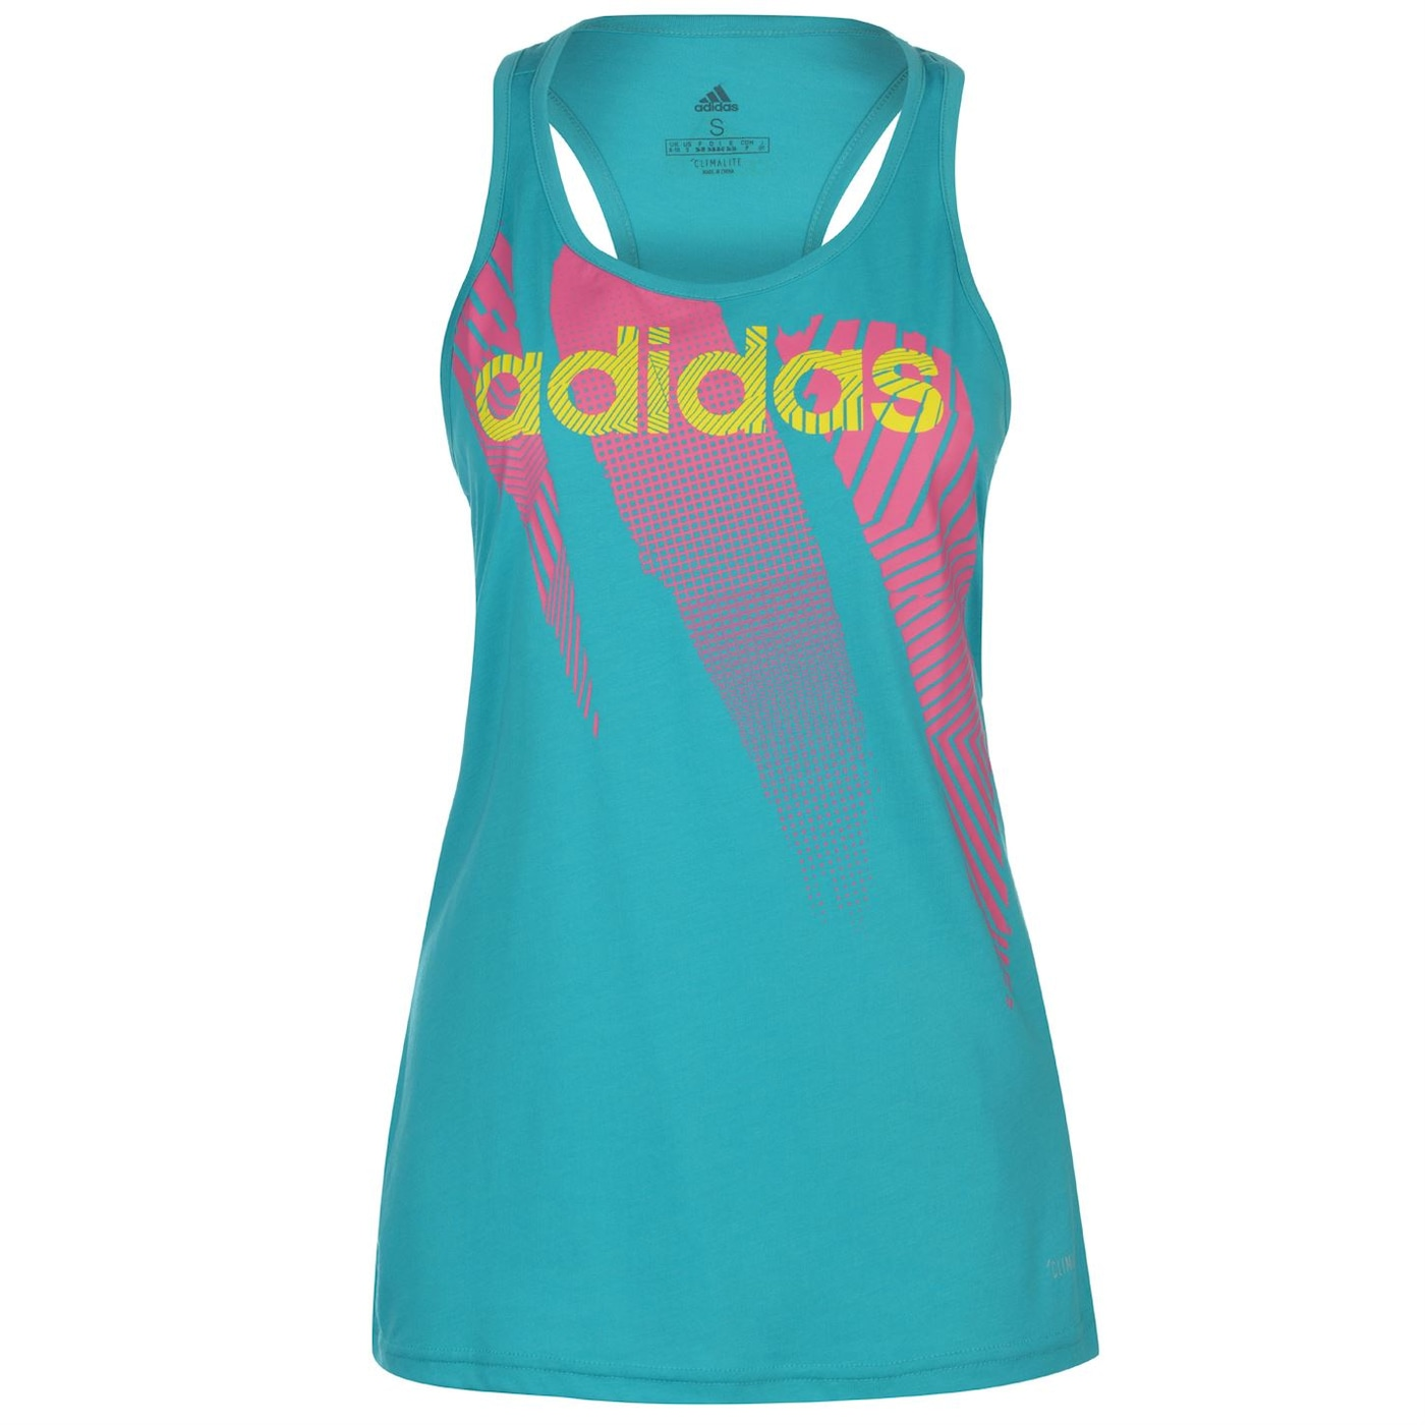 Adidas Season Tank Top Ladies